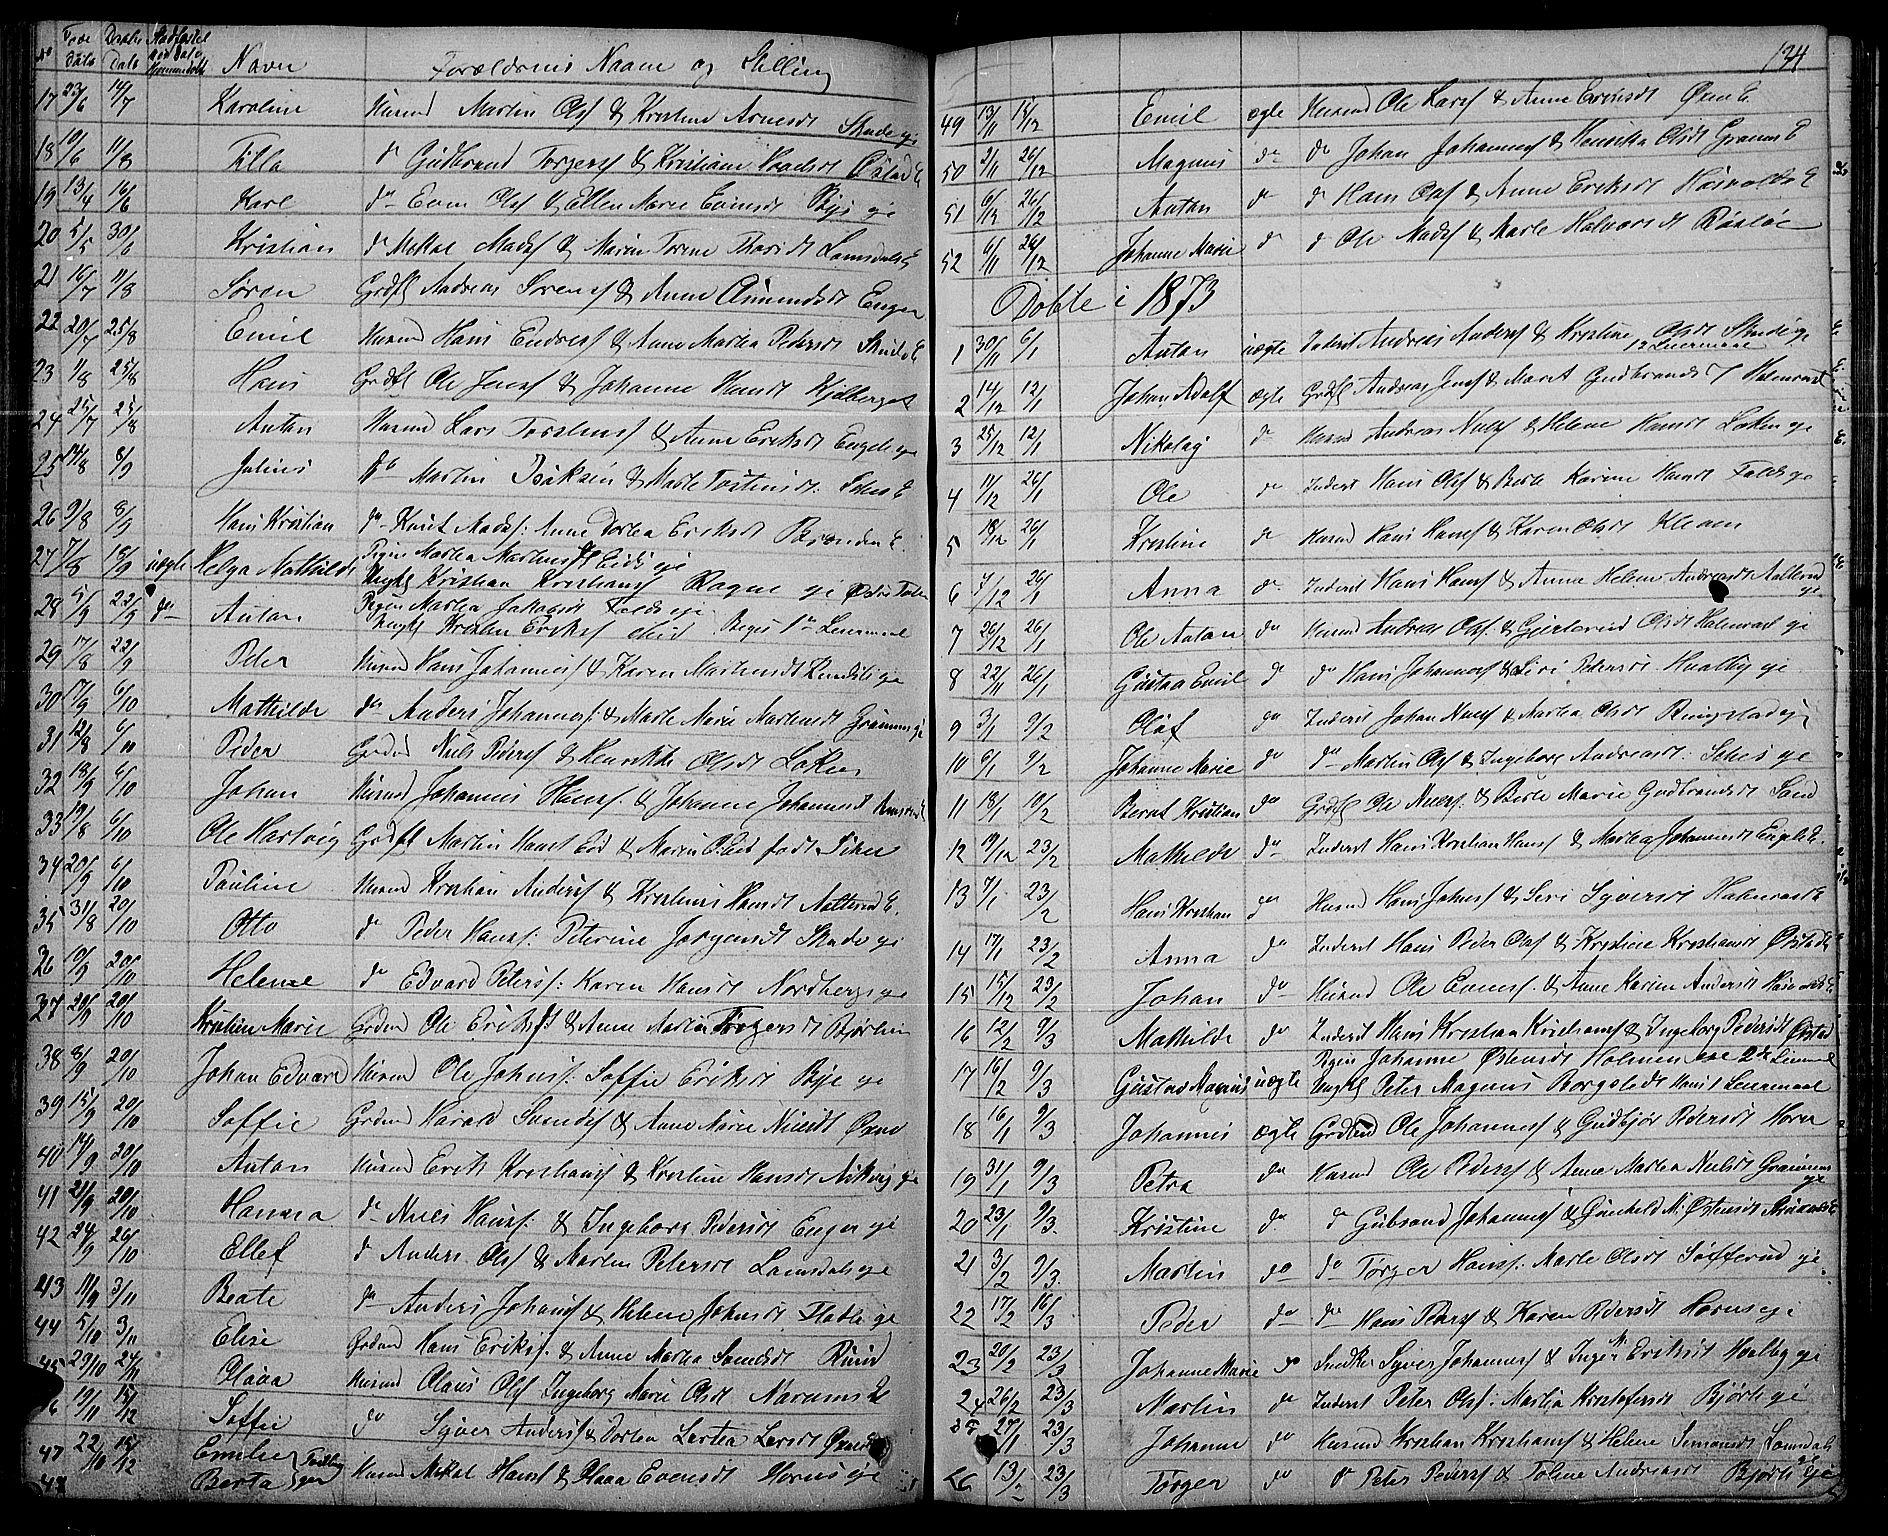 SAH, Søndre Land prestekontor, L/L0001: Klokkerbok nr. 1, 1849-1883, s. 134